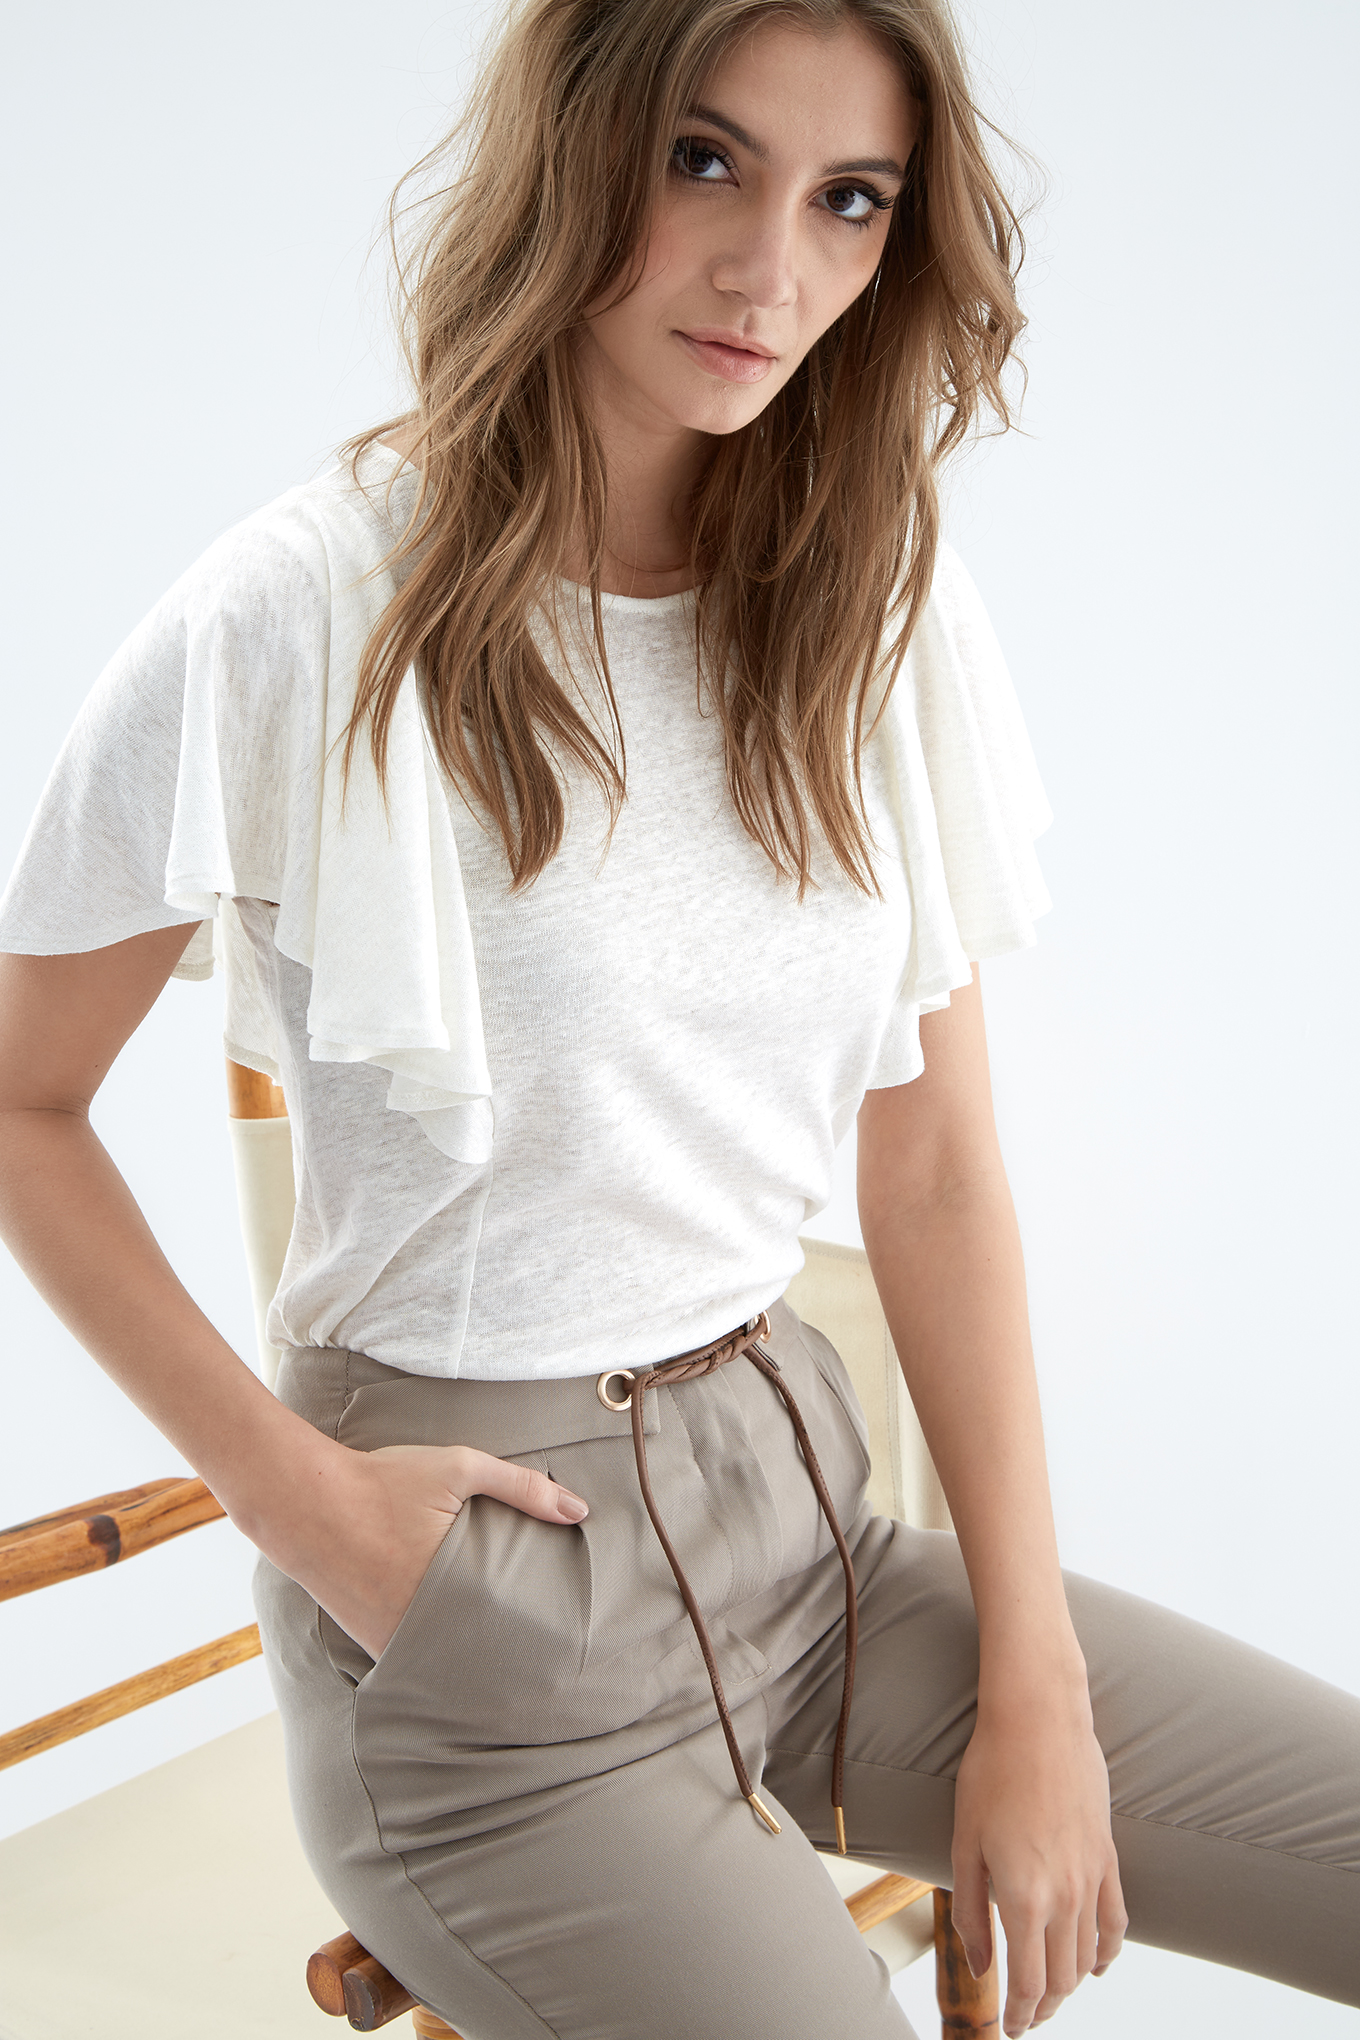 T-Shirt White Casual Woman